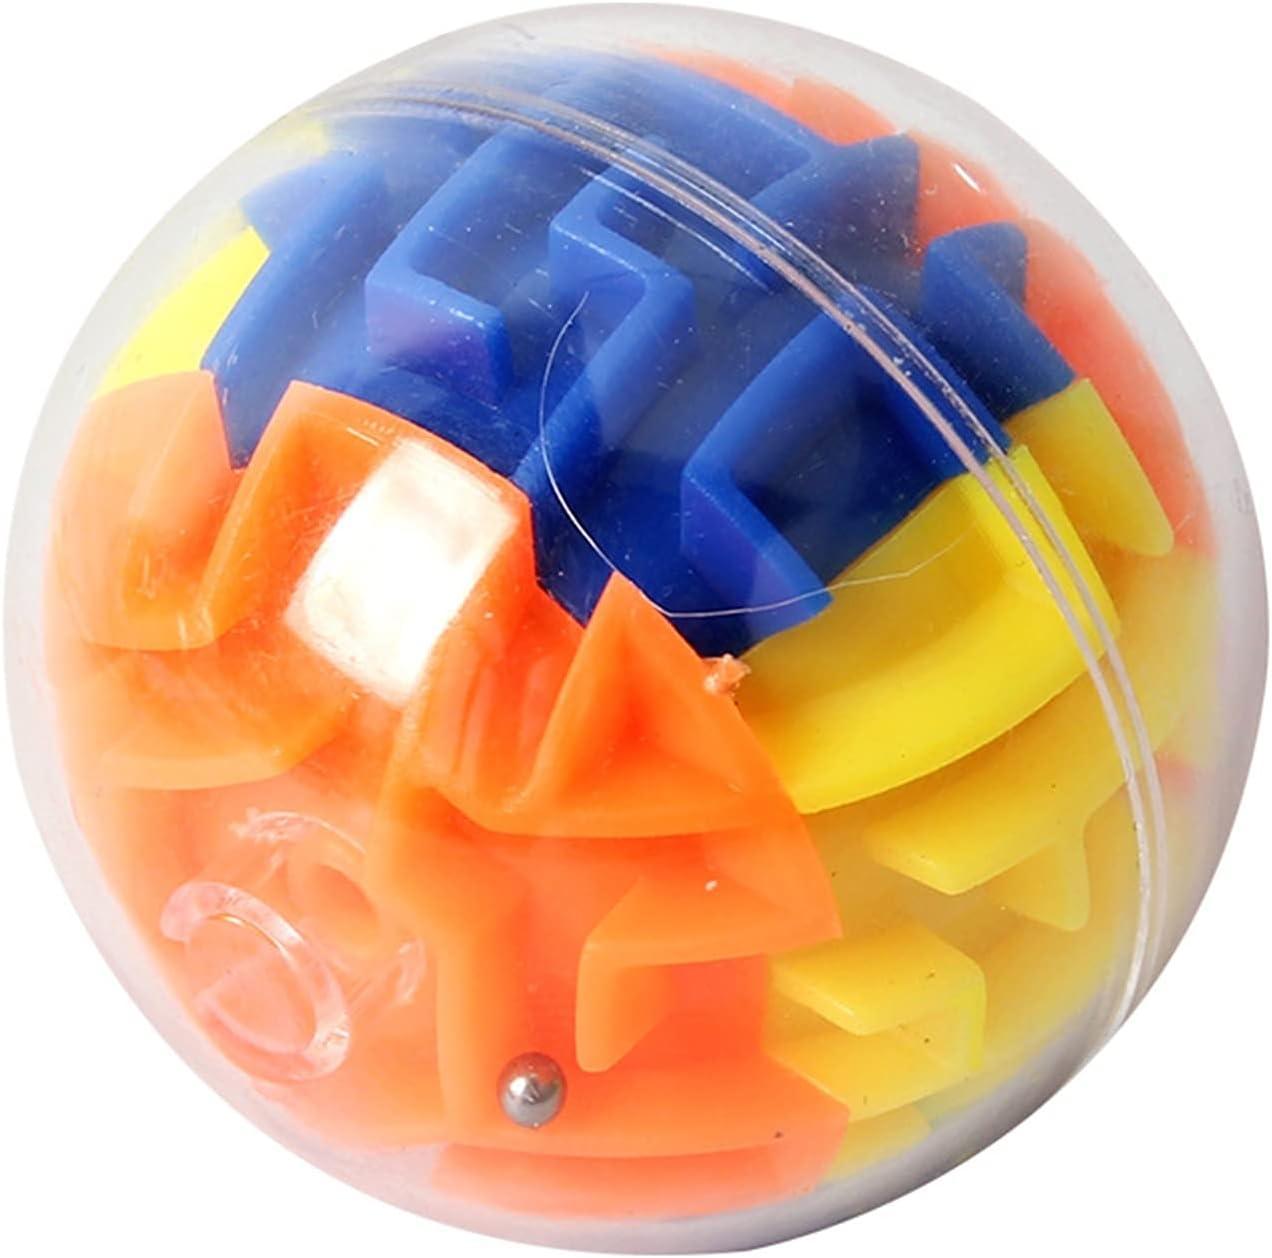 dingtian Halloween Toys 5Pcs Creative Maze Max 41% Max 87% OFF OFF 3D Intel Ball Puzzle